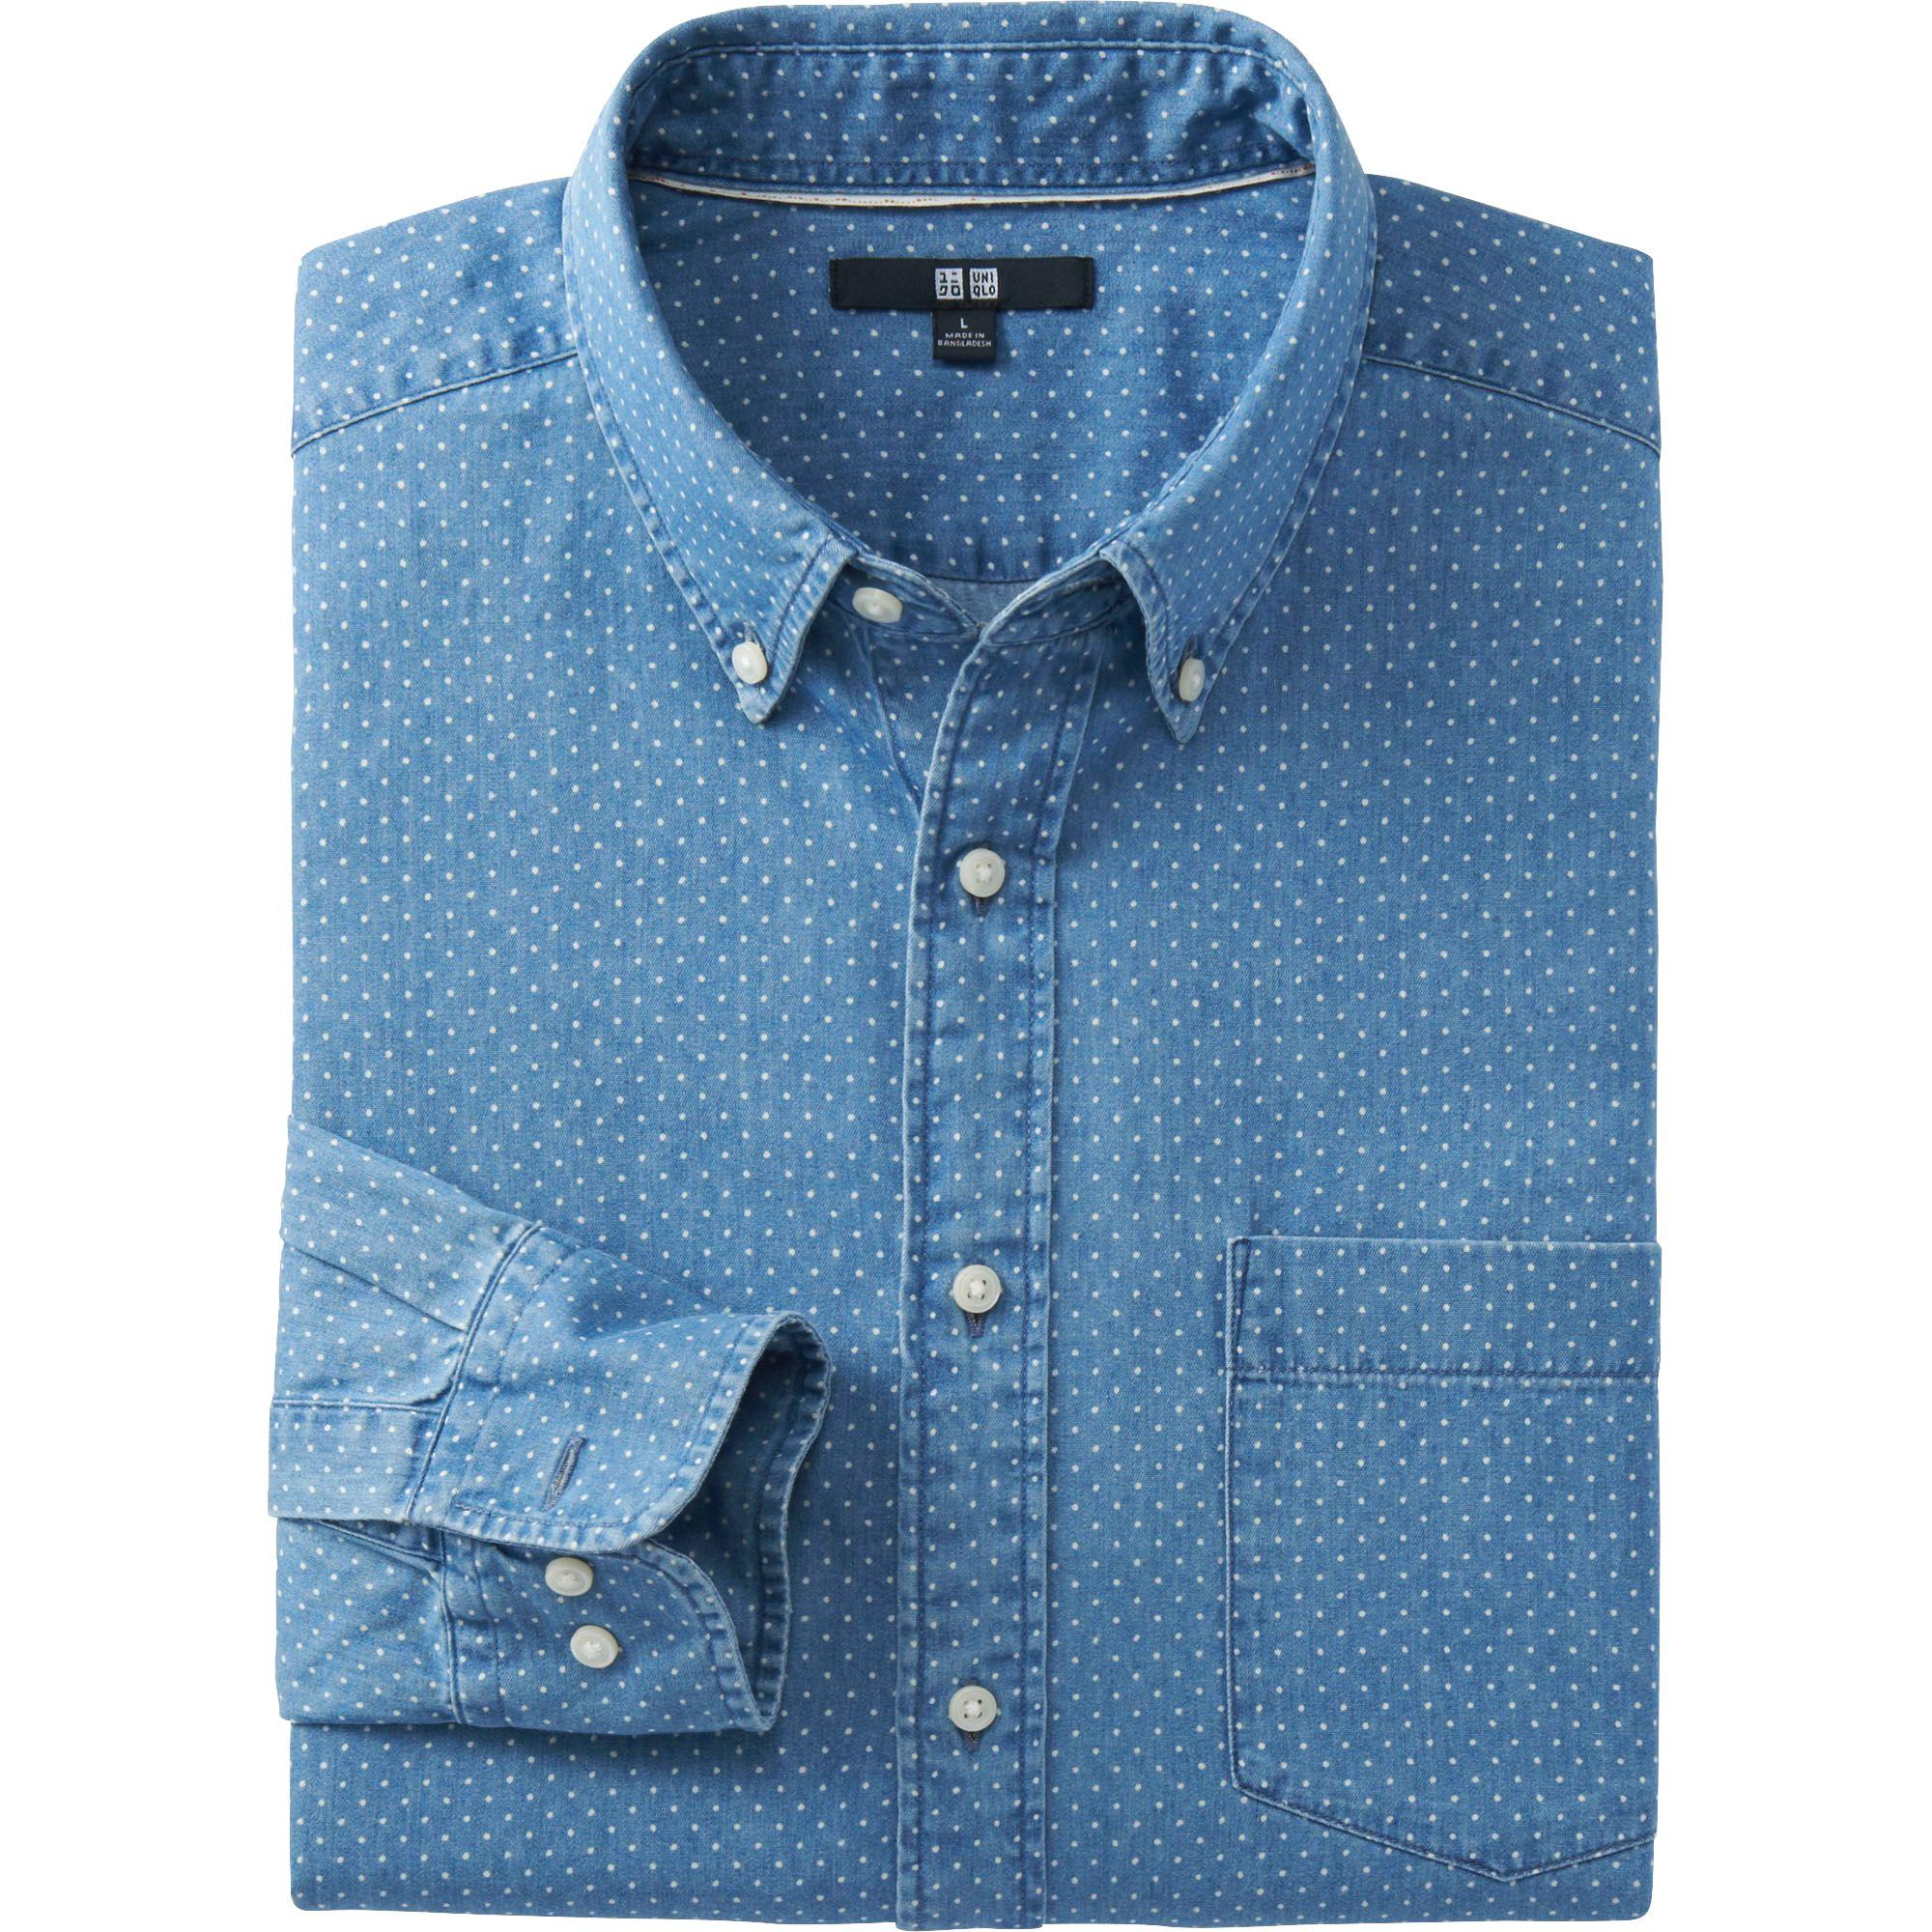 Uniqlo Blue Men Denim Printed Long Sleeve Shirt For Men